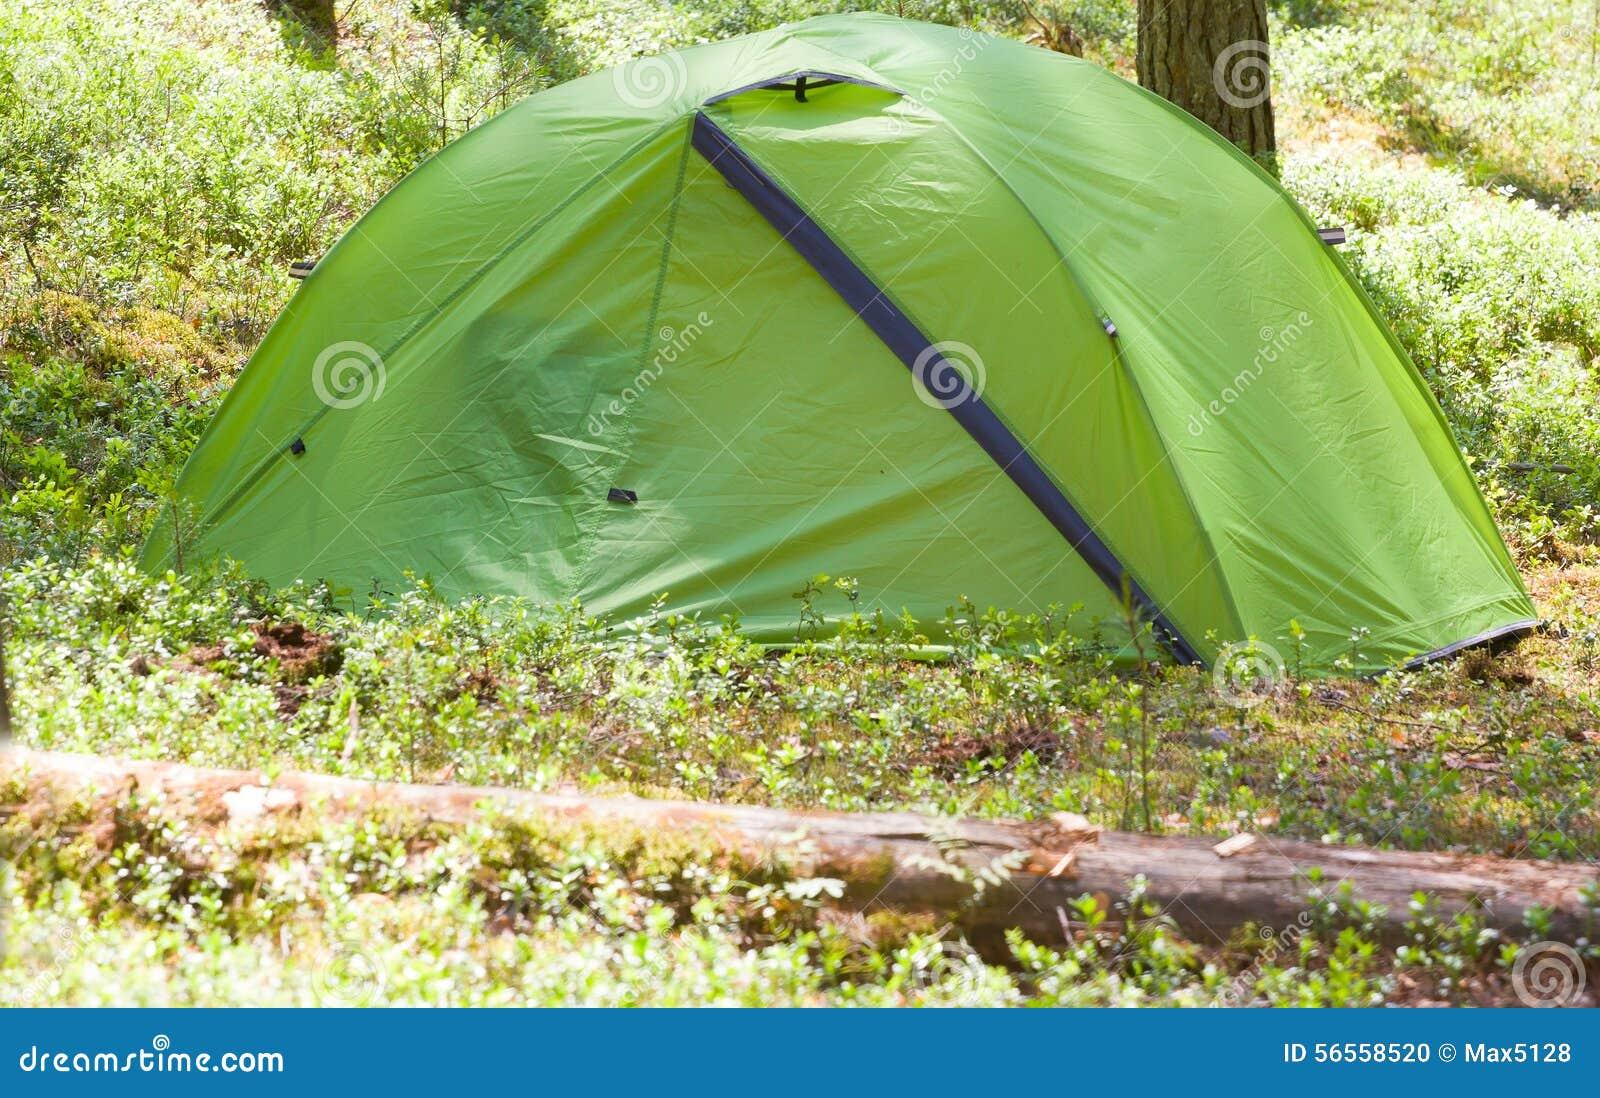 Download Στρατοπέδευση υπαίθρια με τη σκηνή στα ξύλα το καλοκαίρι Στοκ Εικόνες - εικόνα από lifestyle, χλόη: 56558520